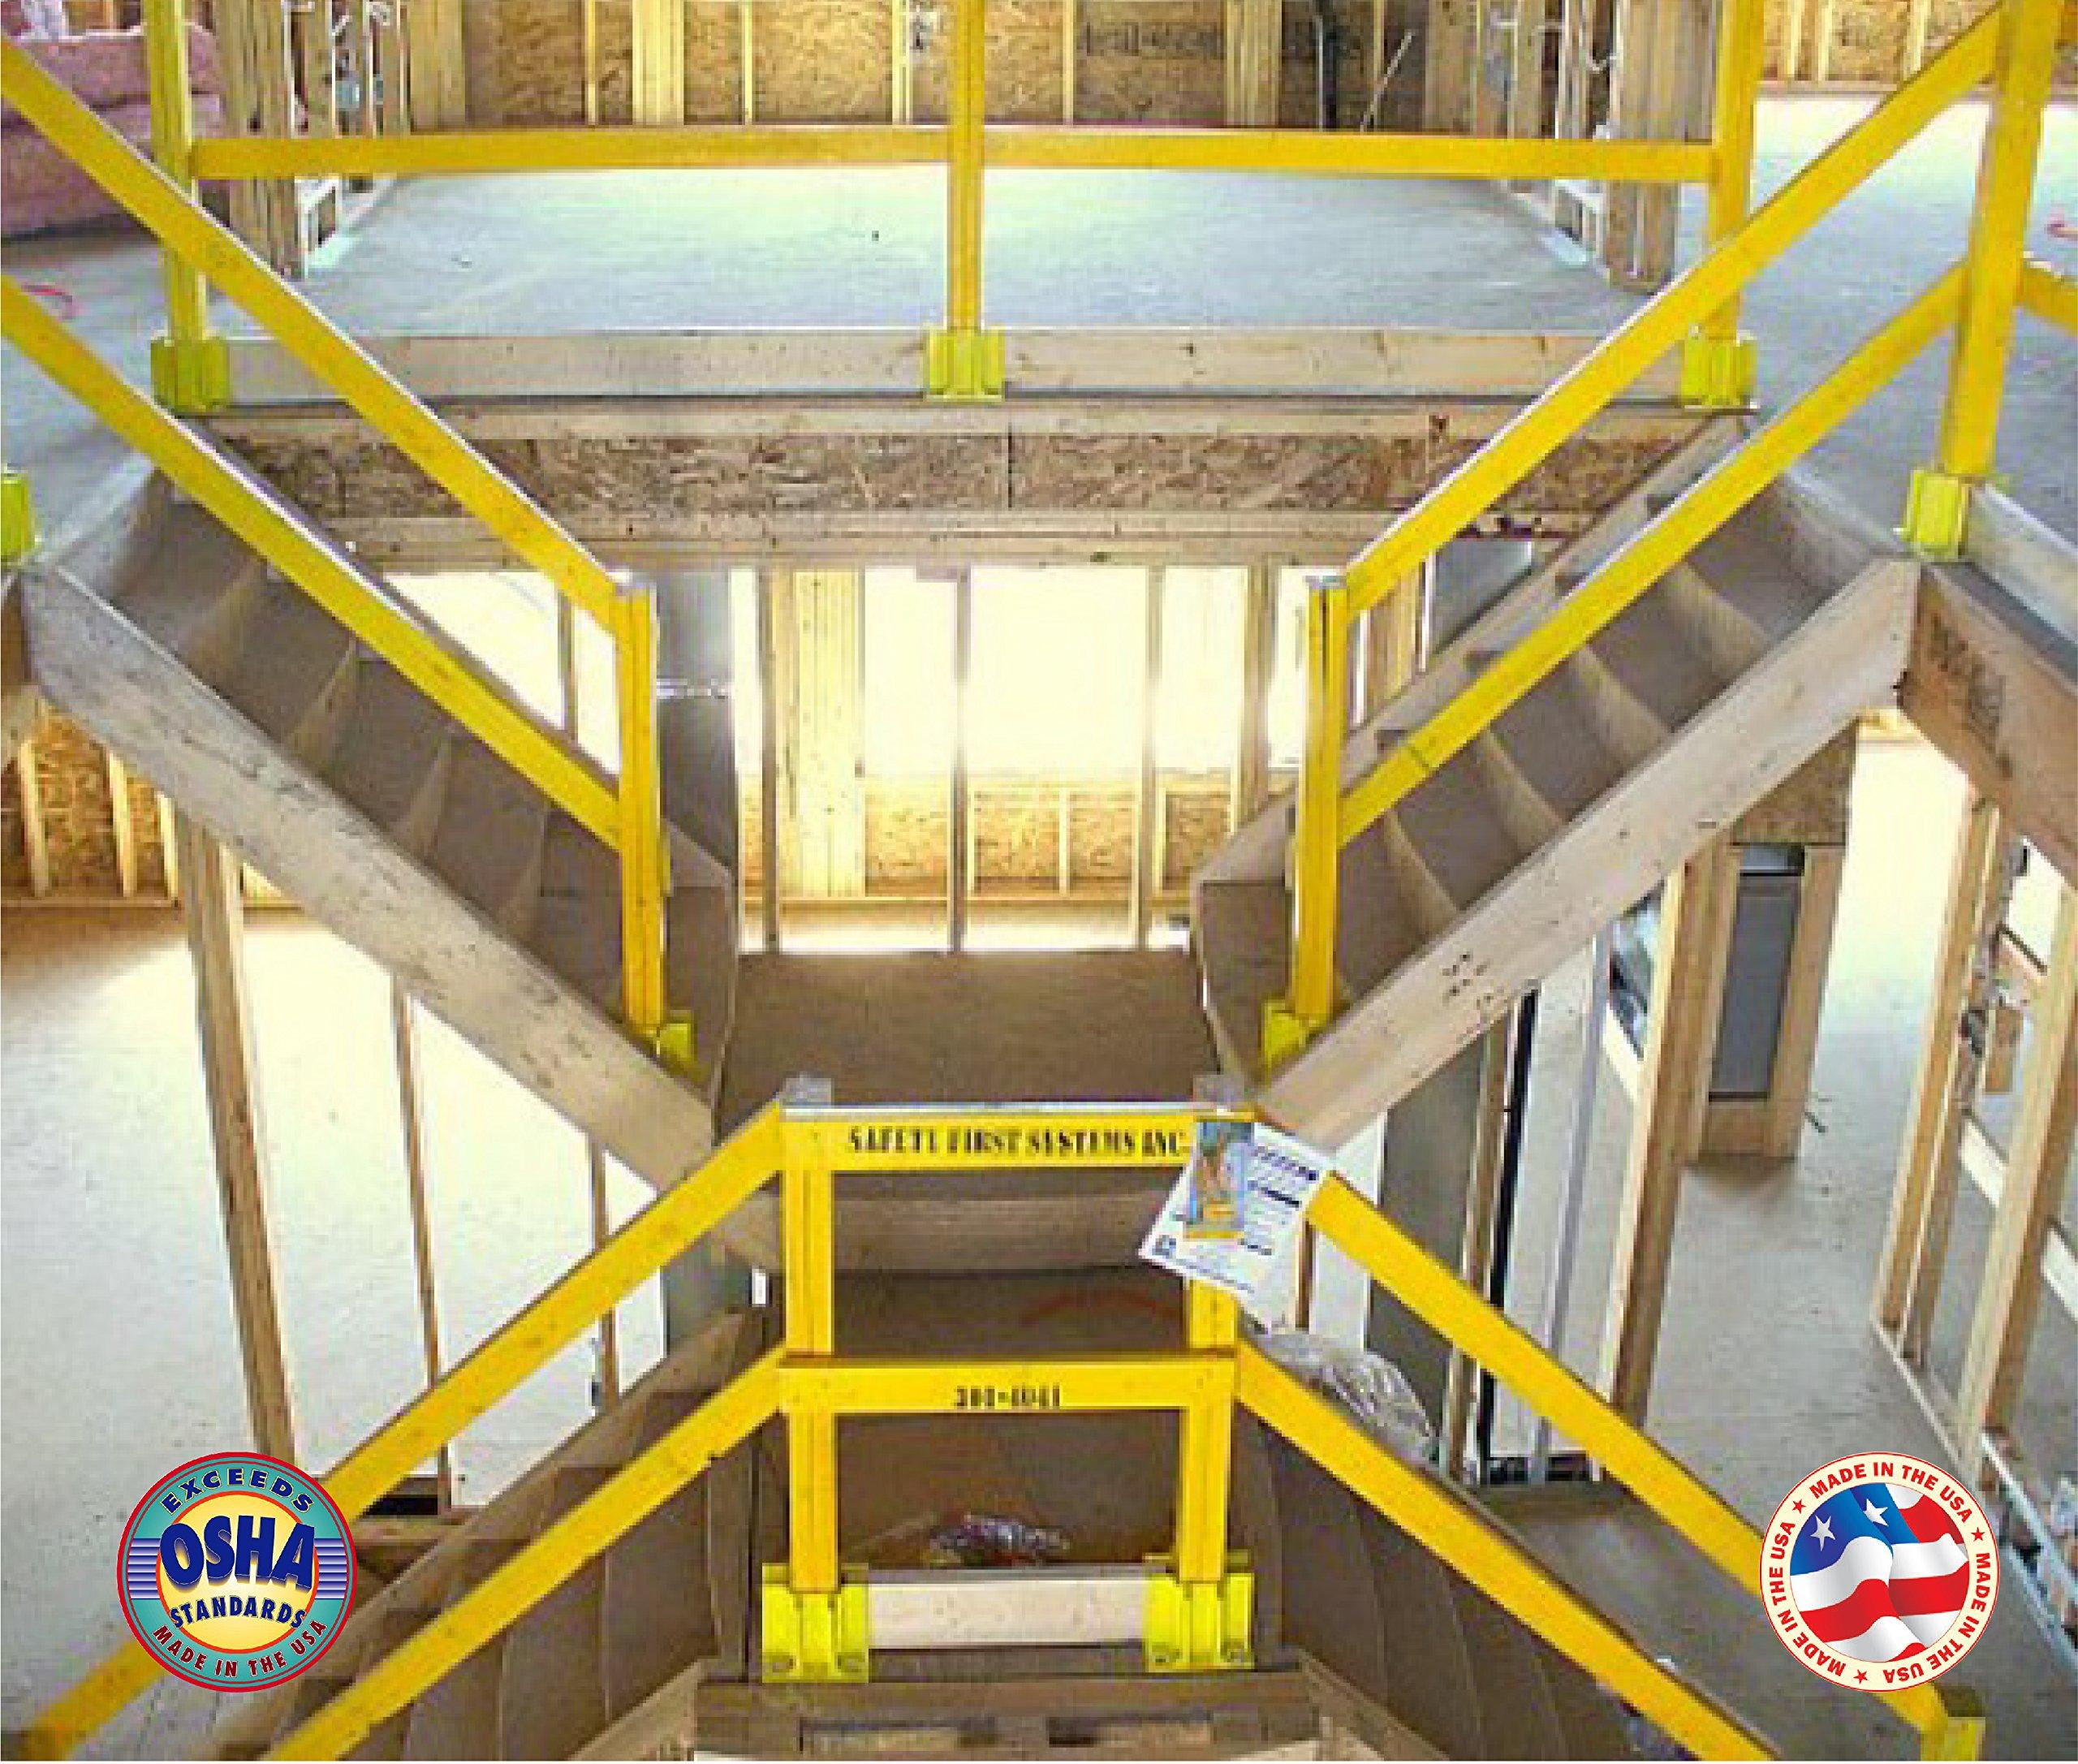 Safety Boot Yellow OSHA Temporary Guard Rail System by Safety Maker (12 Units) by Safety Maker, Inc. (Image #5)